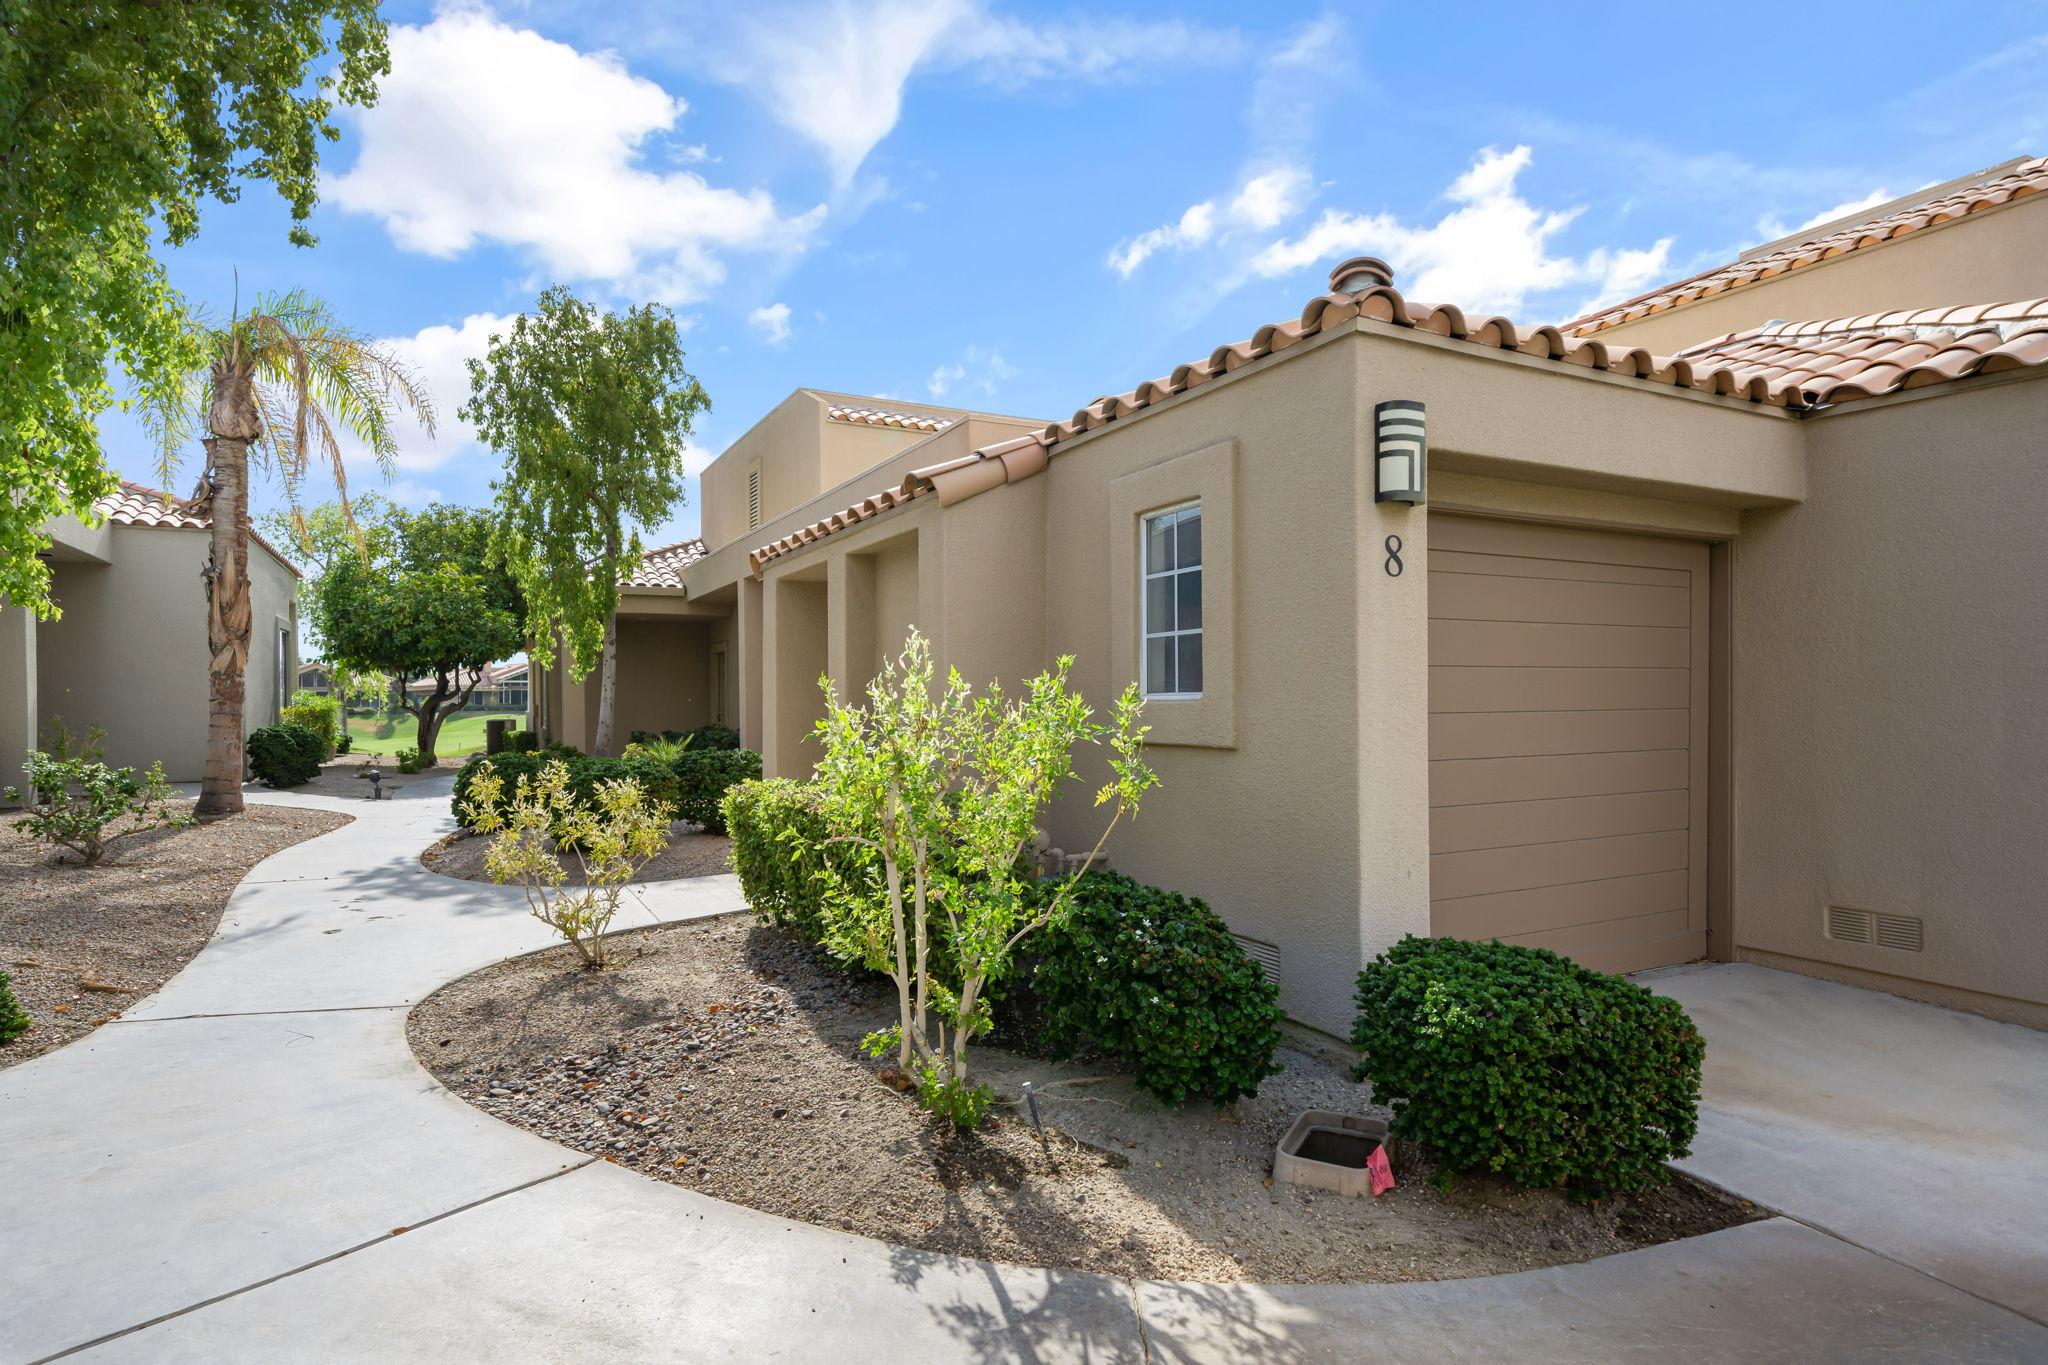 8 Oak Tree Dr, Rancho Mirage, CA 92270, USA Photo 29